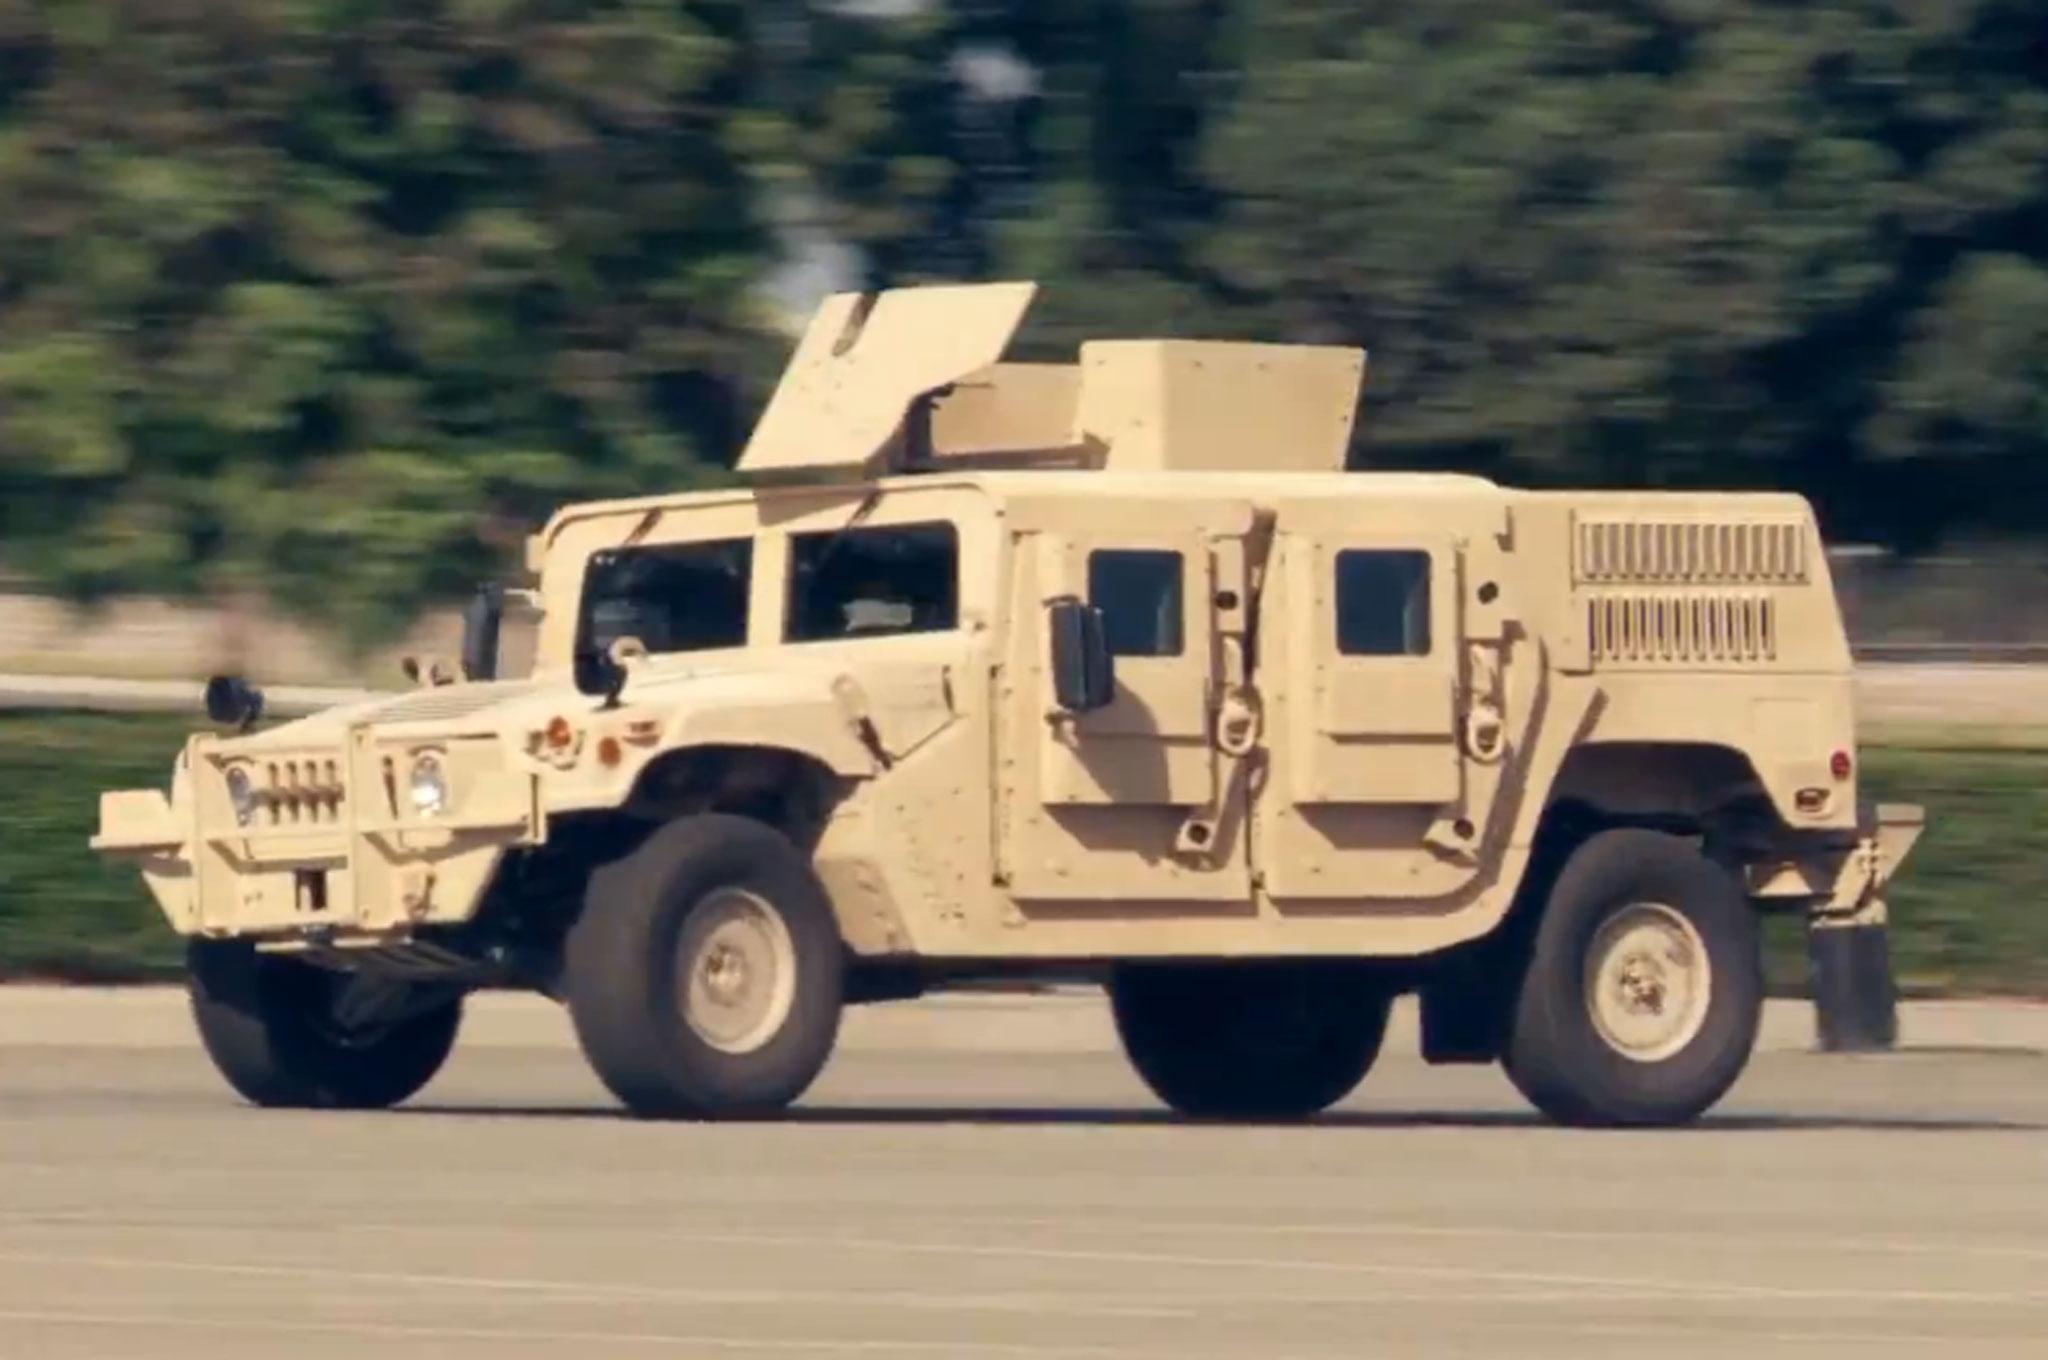 Banks Engineered 1984 General Humvee Around Figure Eight1